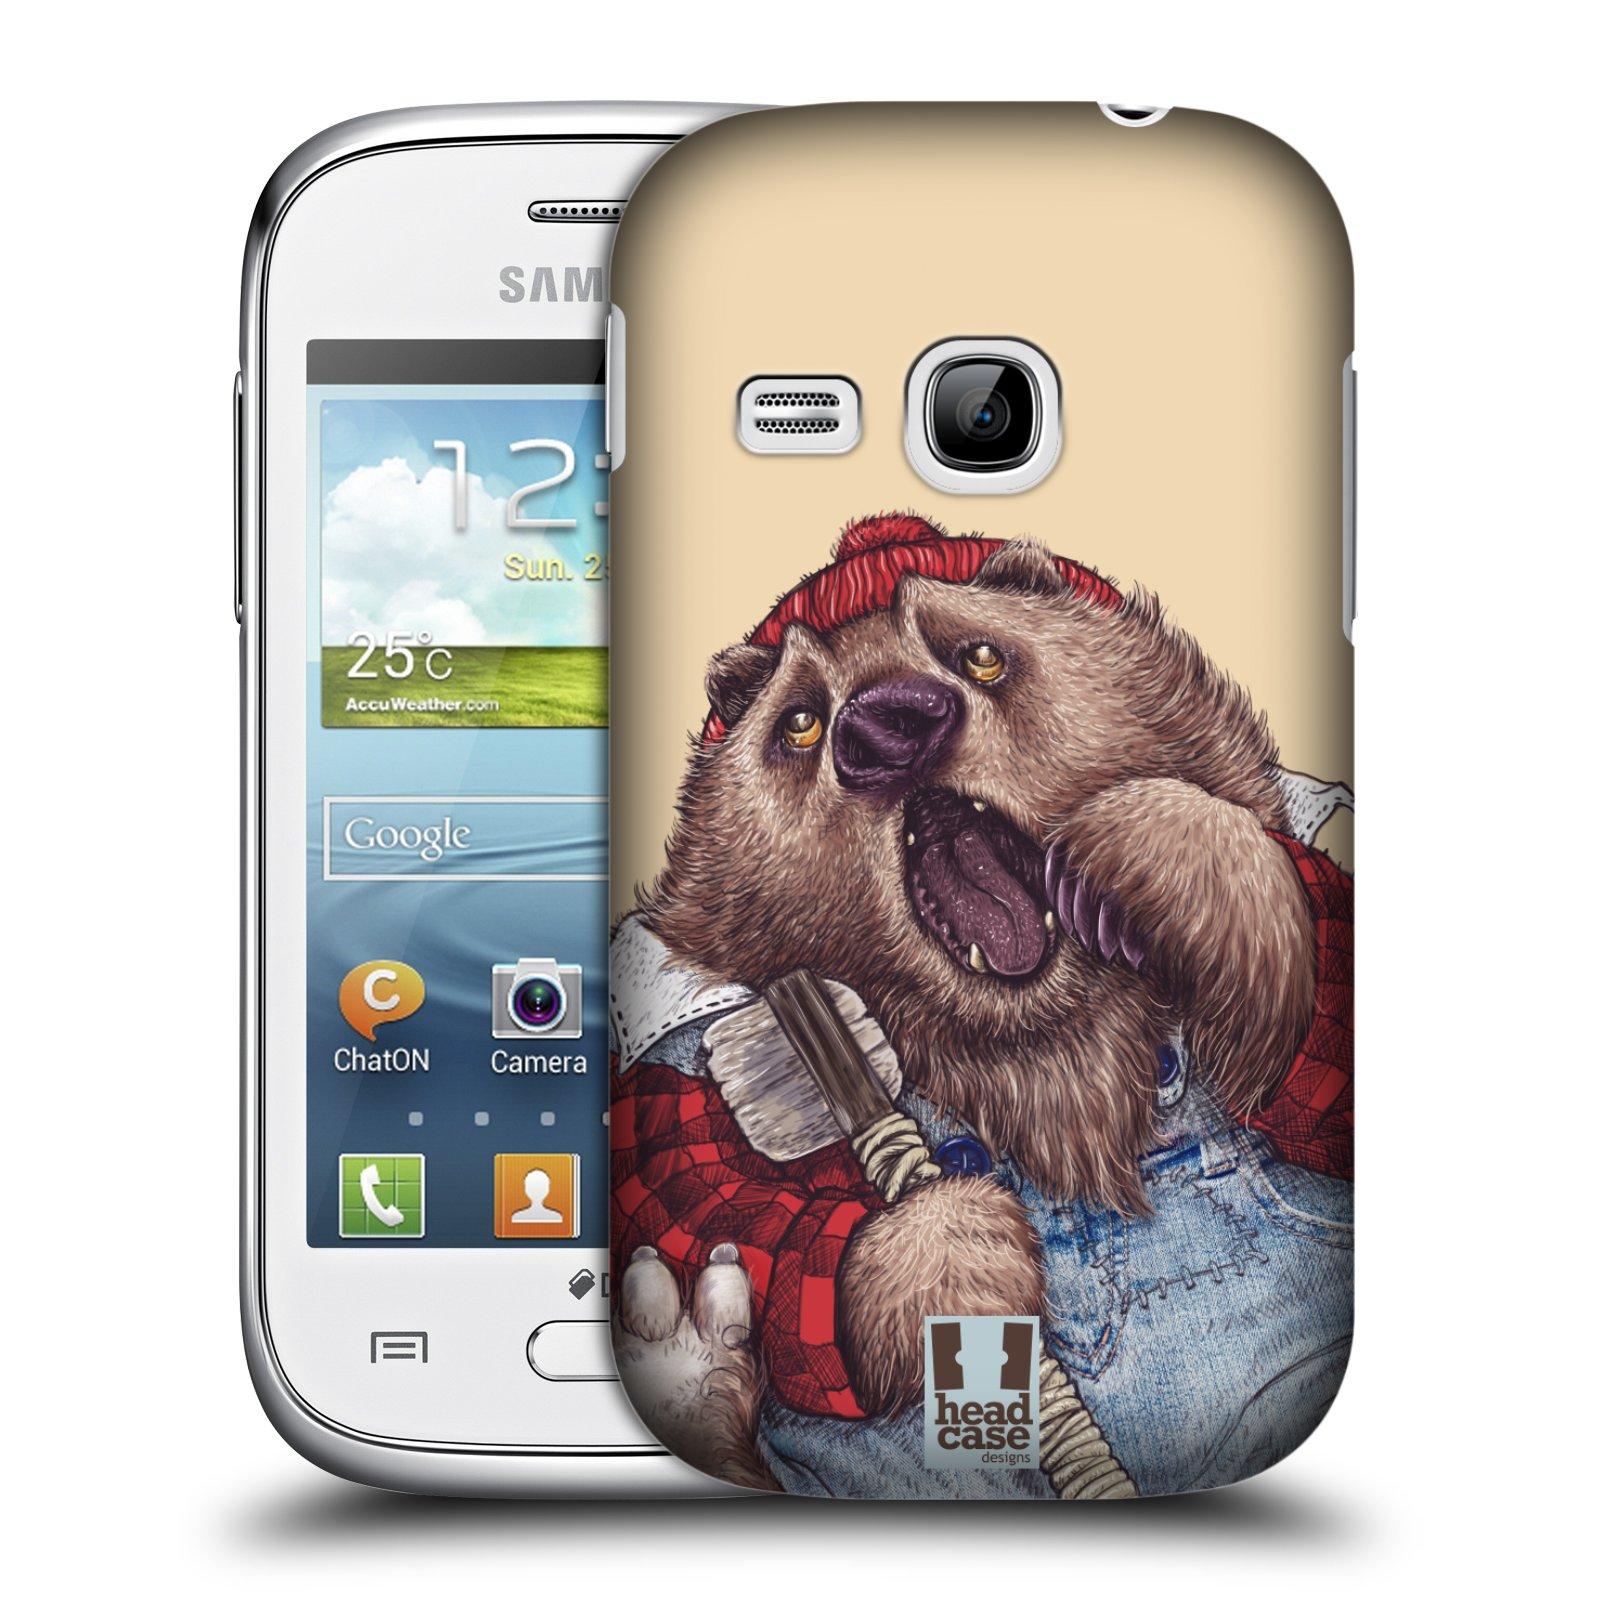 HEAD CASE plastový obal na mobil SAMSUNG Galaxy Young S6310 vzor Kreslená zvířátka medvěd